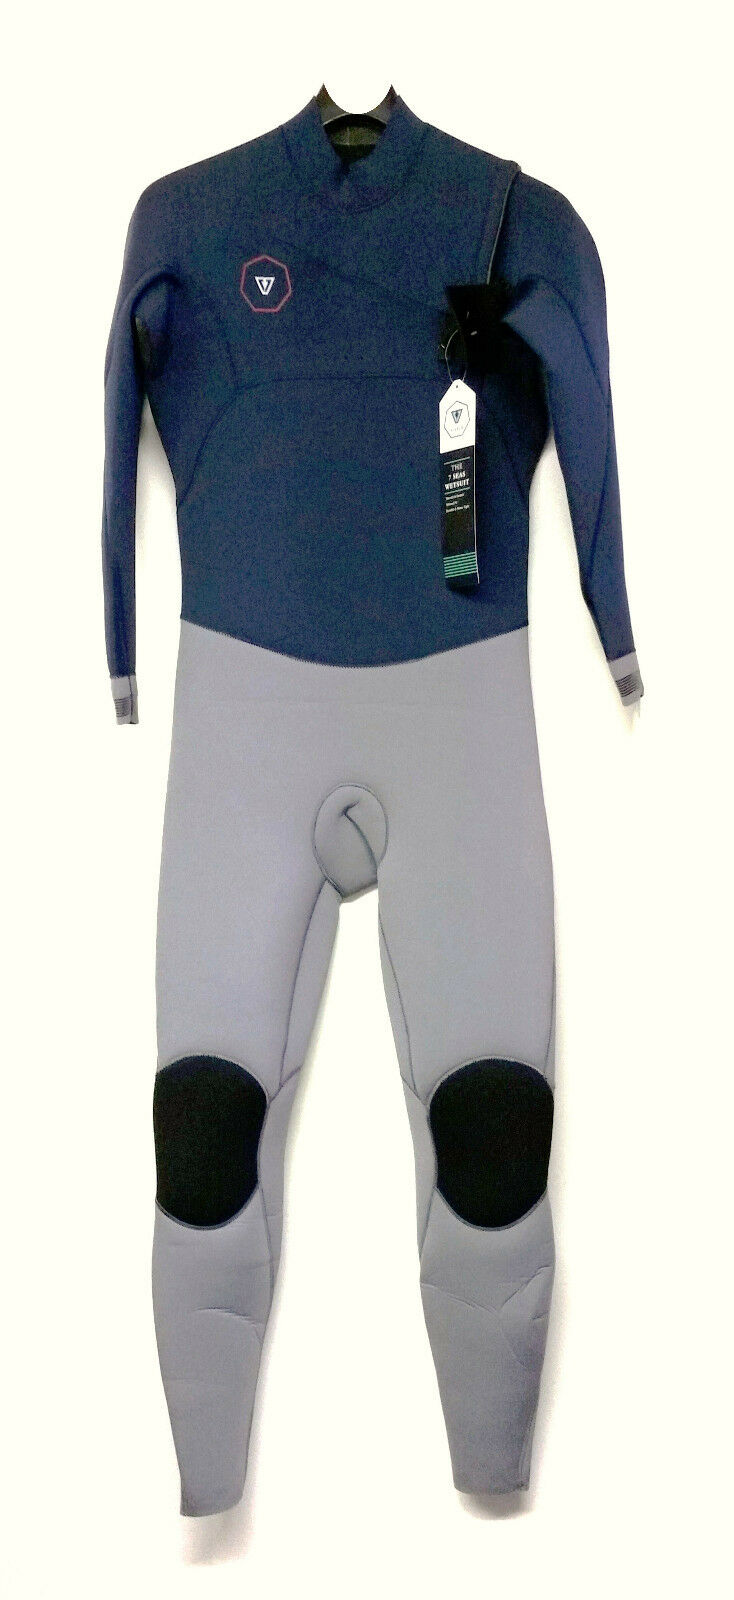 VISSLA Men's 4 3 SEVEN SEAS 50  50 CZ Full Wetsuit -DNL Size  Med Tall - Last One  classic fashion